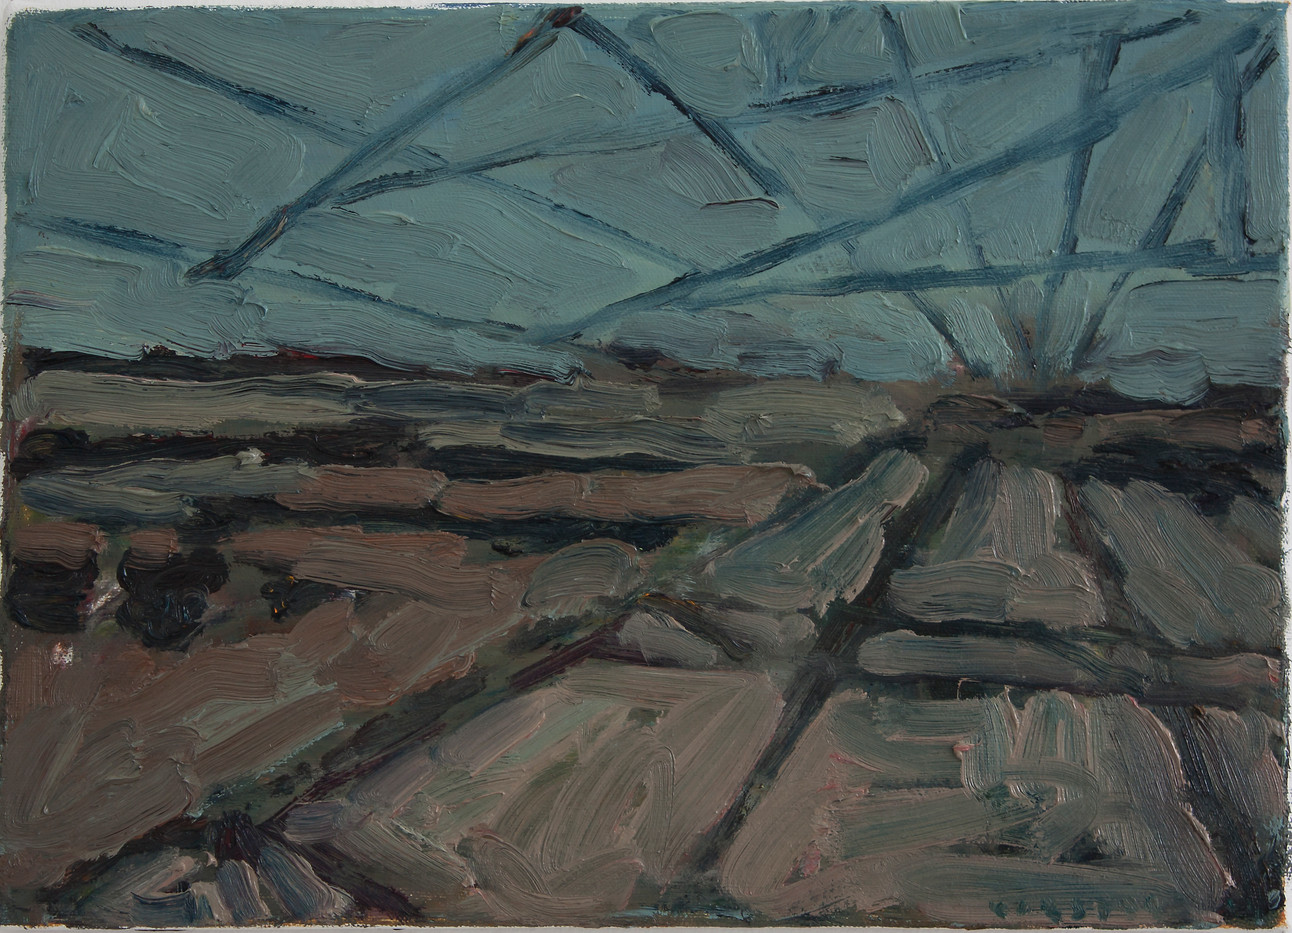 Anton Karstel | Property (Phalaborwa) | 2014 | Oil on Canvas | 25.5 x 35.5 cm